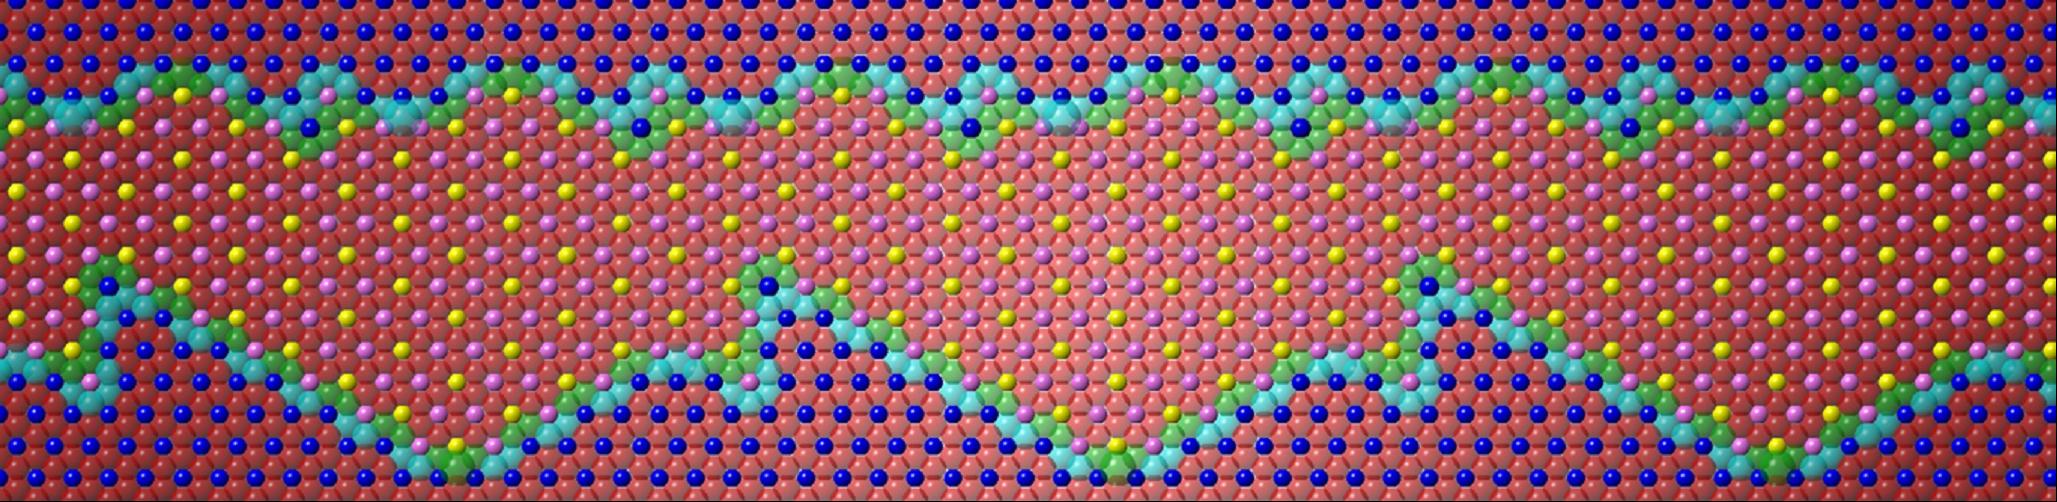 Image illustrating energy chemistry